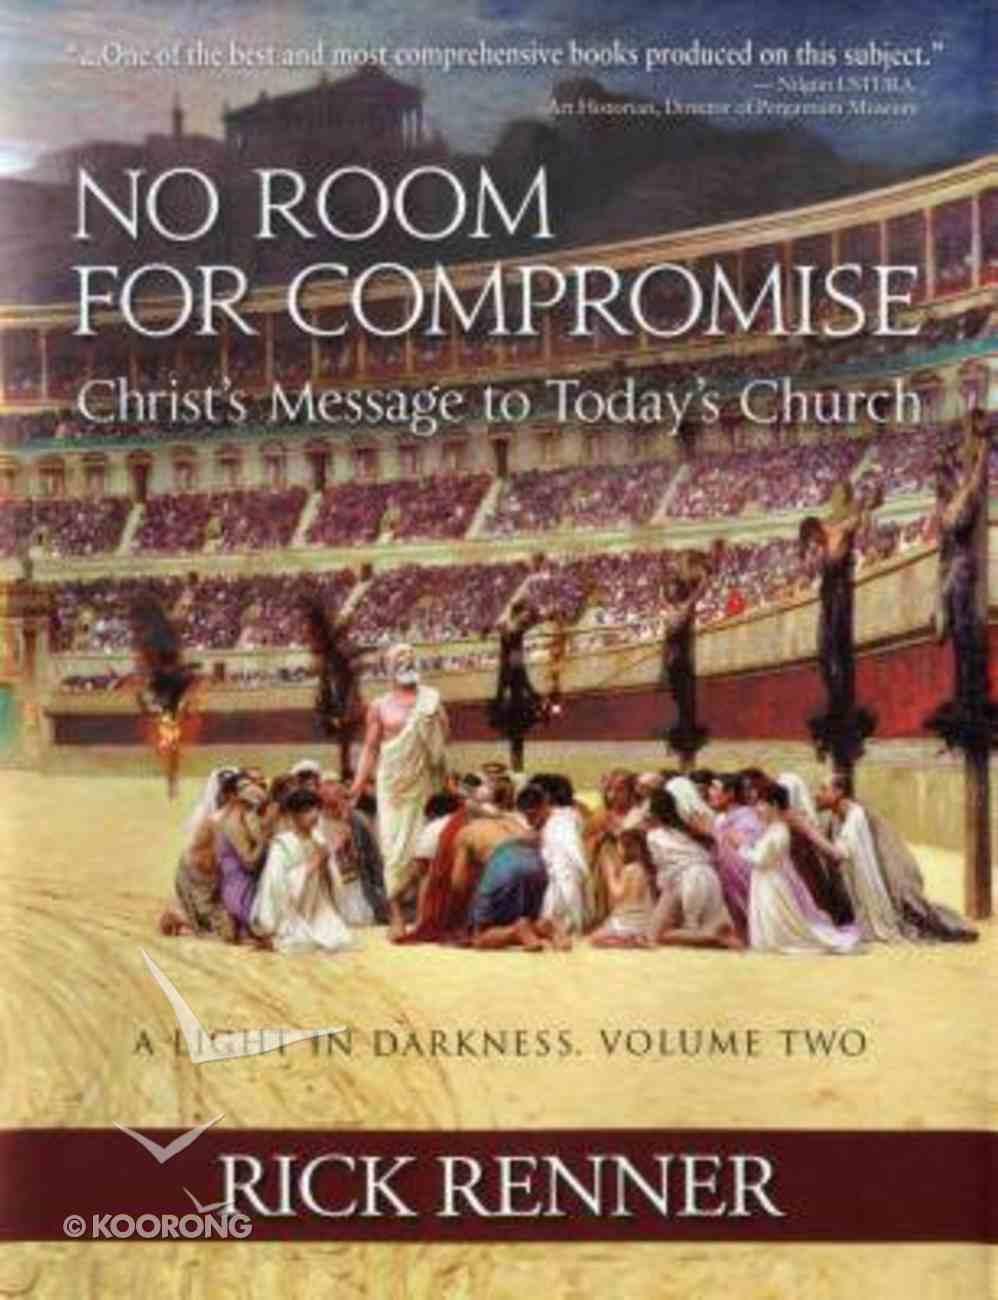 No Room For Compromise, a Light in Darkness, (Volume 2) Hardback